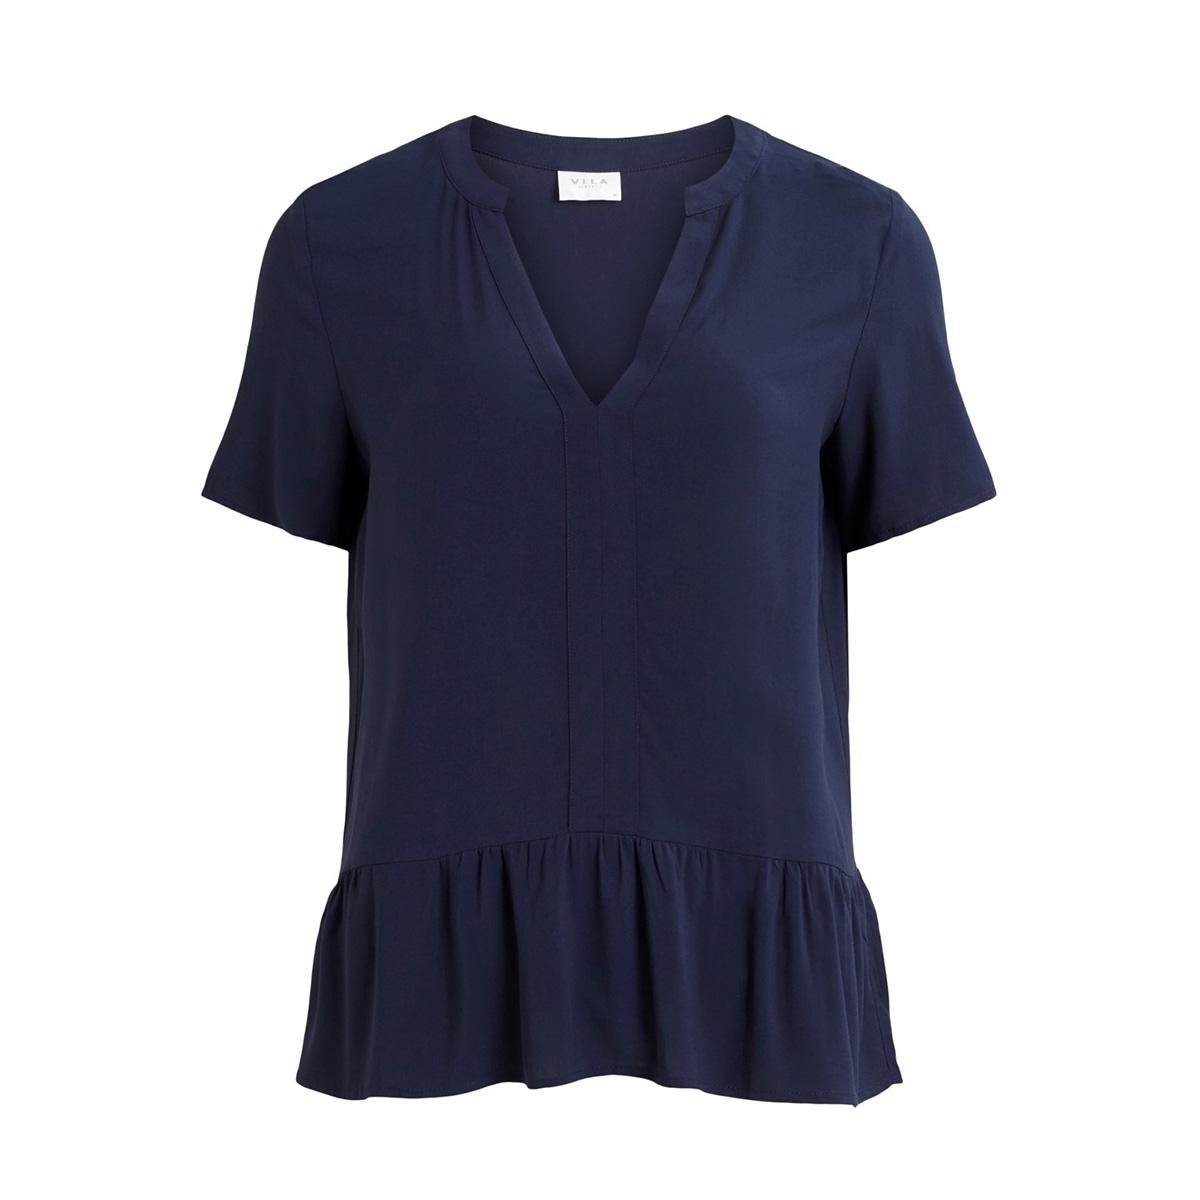 vilausa v-neck s/s top/su 14058035 vila t-shirt navy blazer